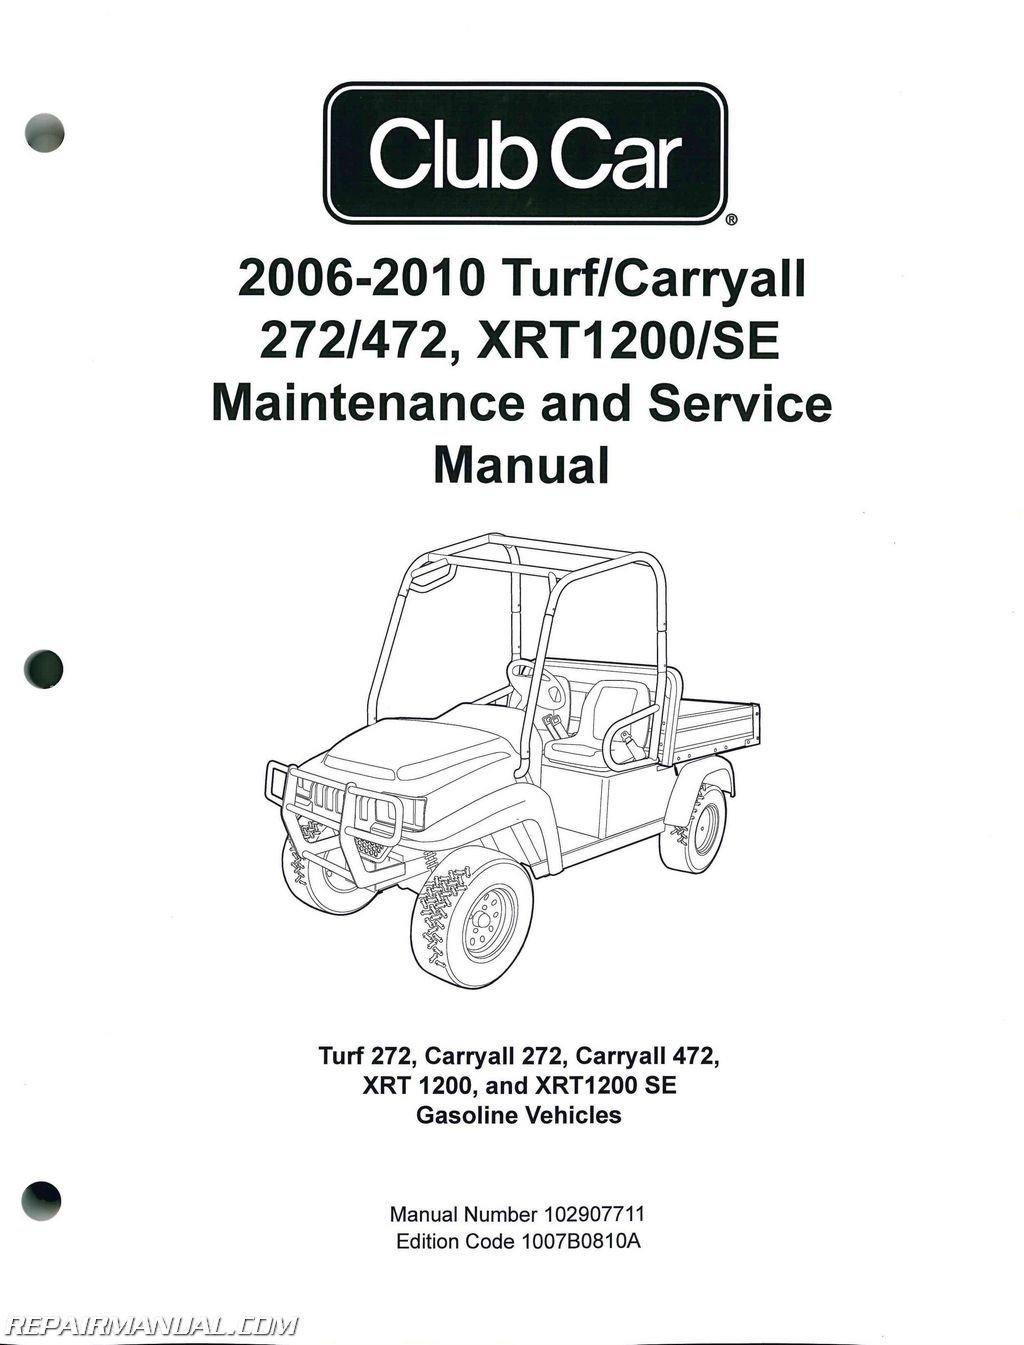 102907711 2006-2010 Club Car Turf, Carryall 272 472, XRT1200 SE Turf 272,  Carryall 272, Carryall 472, XRT 1200, and XRT1200 SE Gas Service Manual: ...